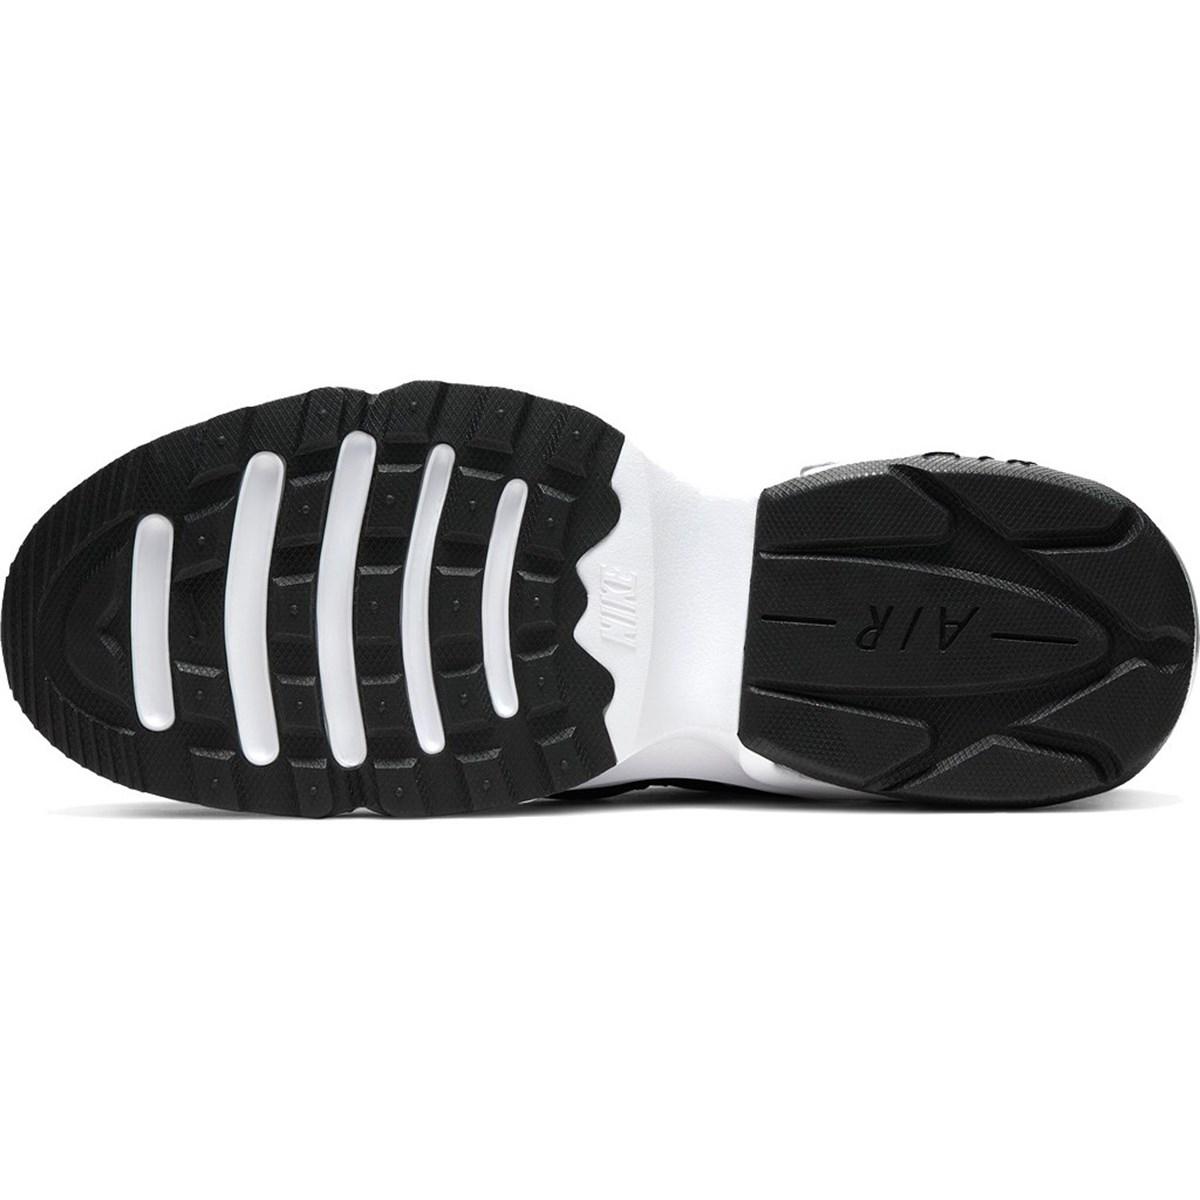 Air Max Graviton Lea Erkek Siyah Spor Ayakkabı